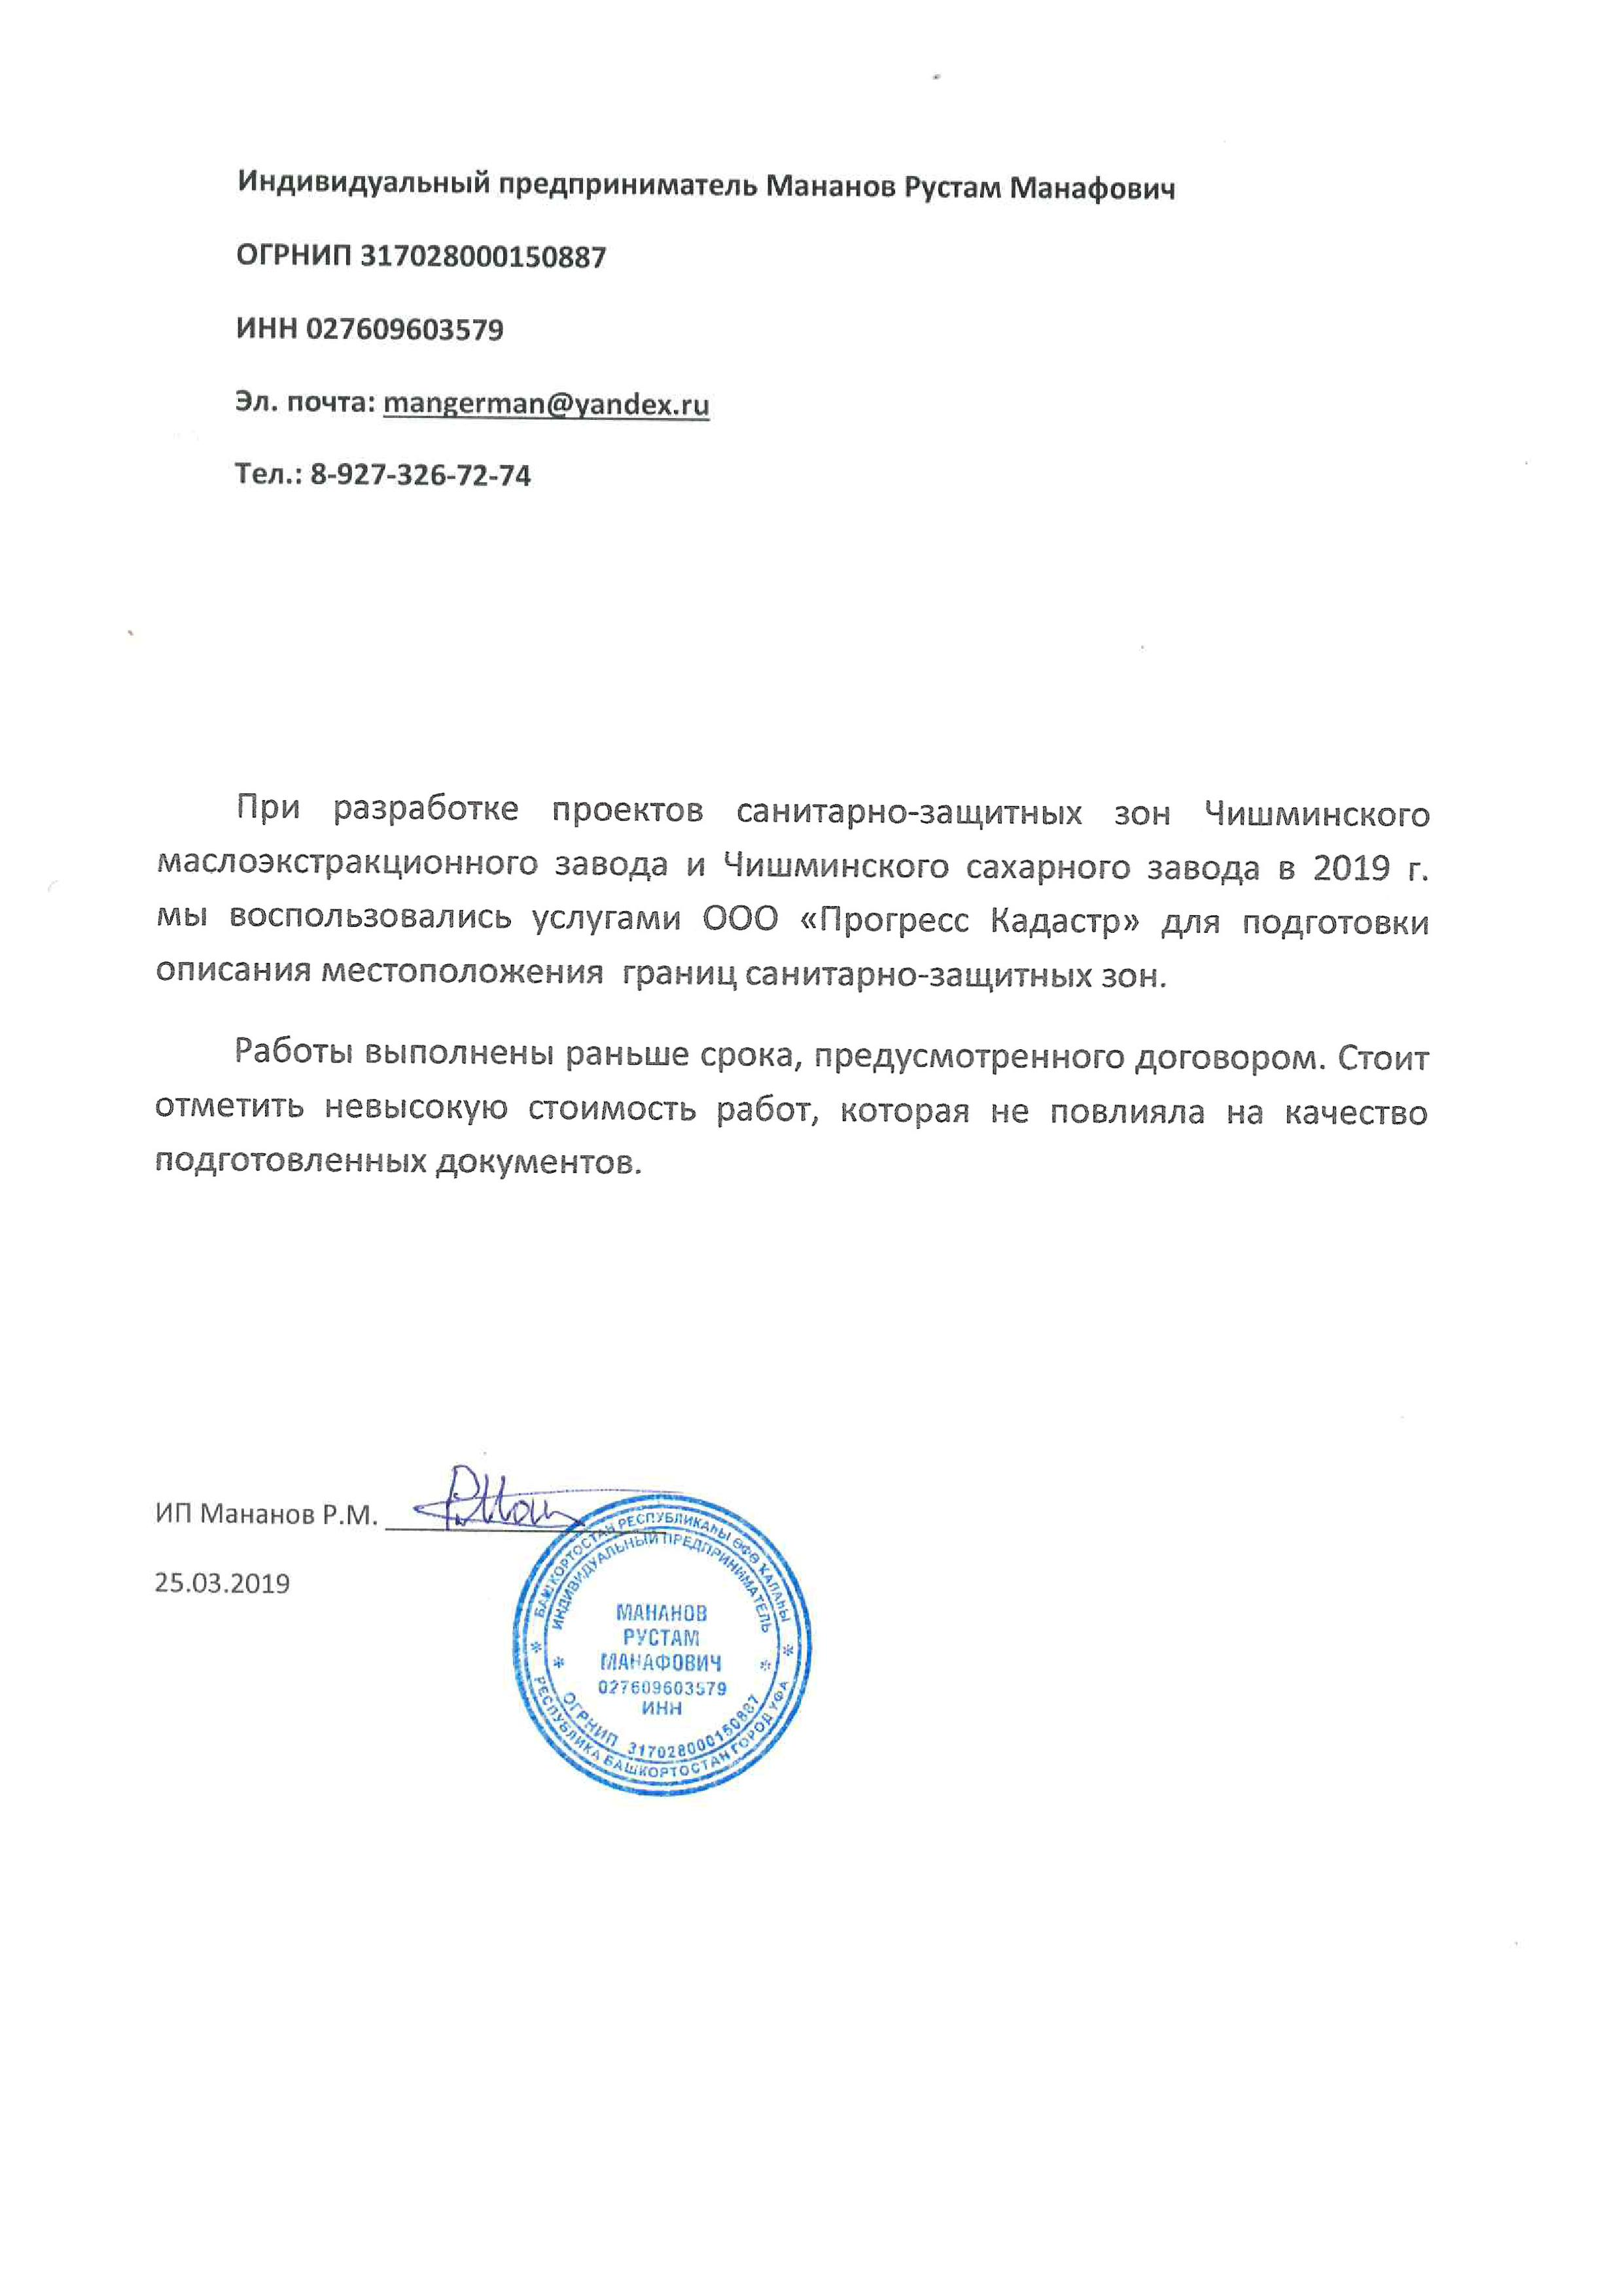 ИП Мананов Р.М.